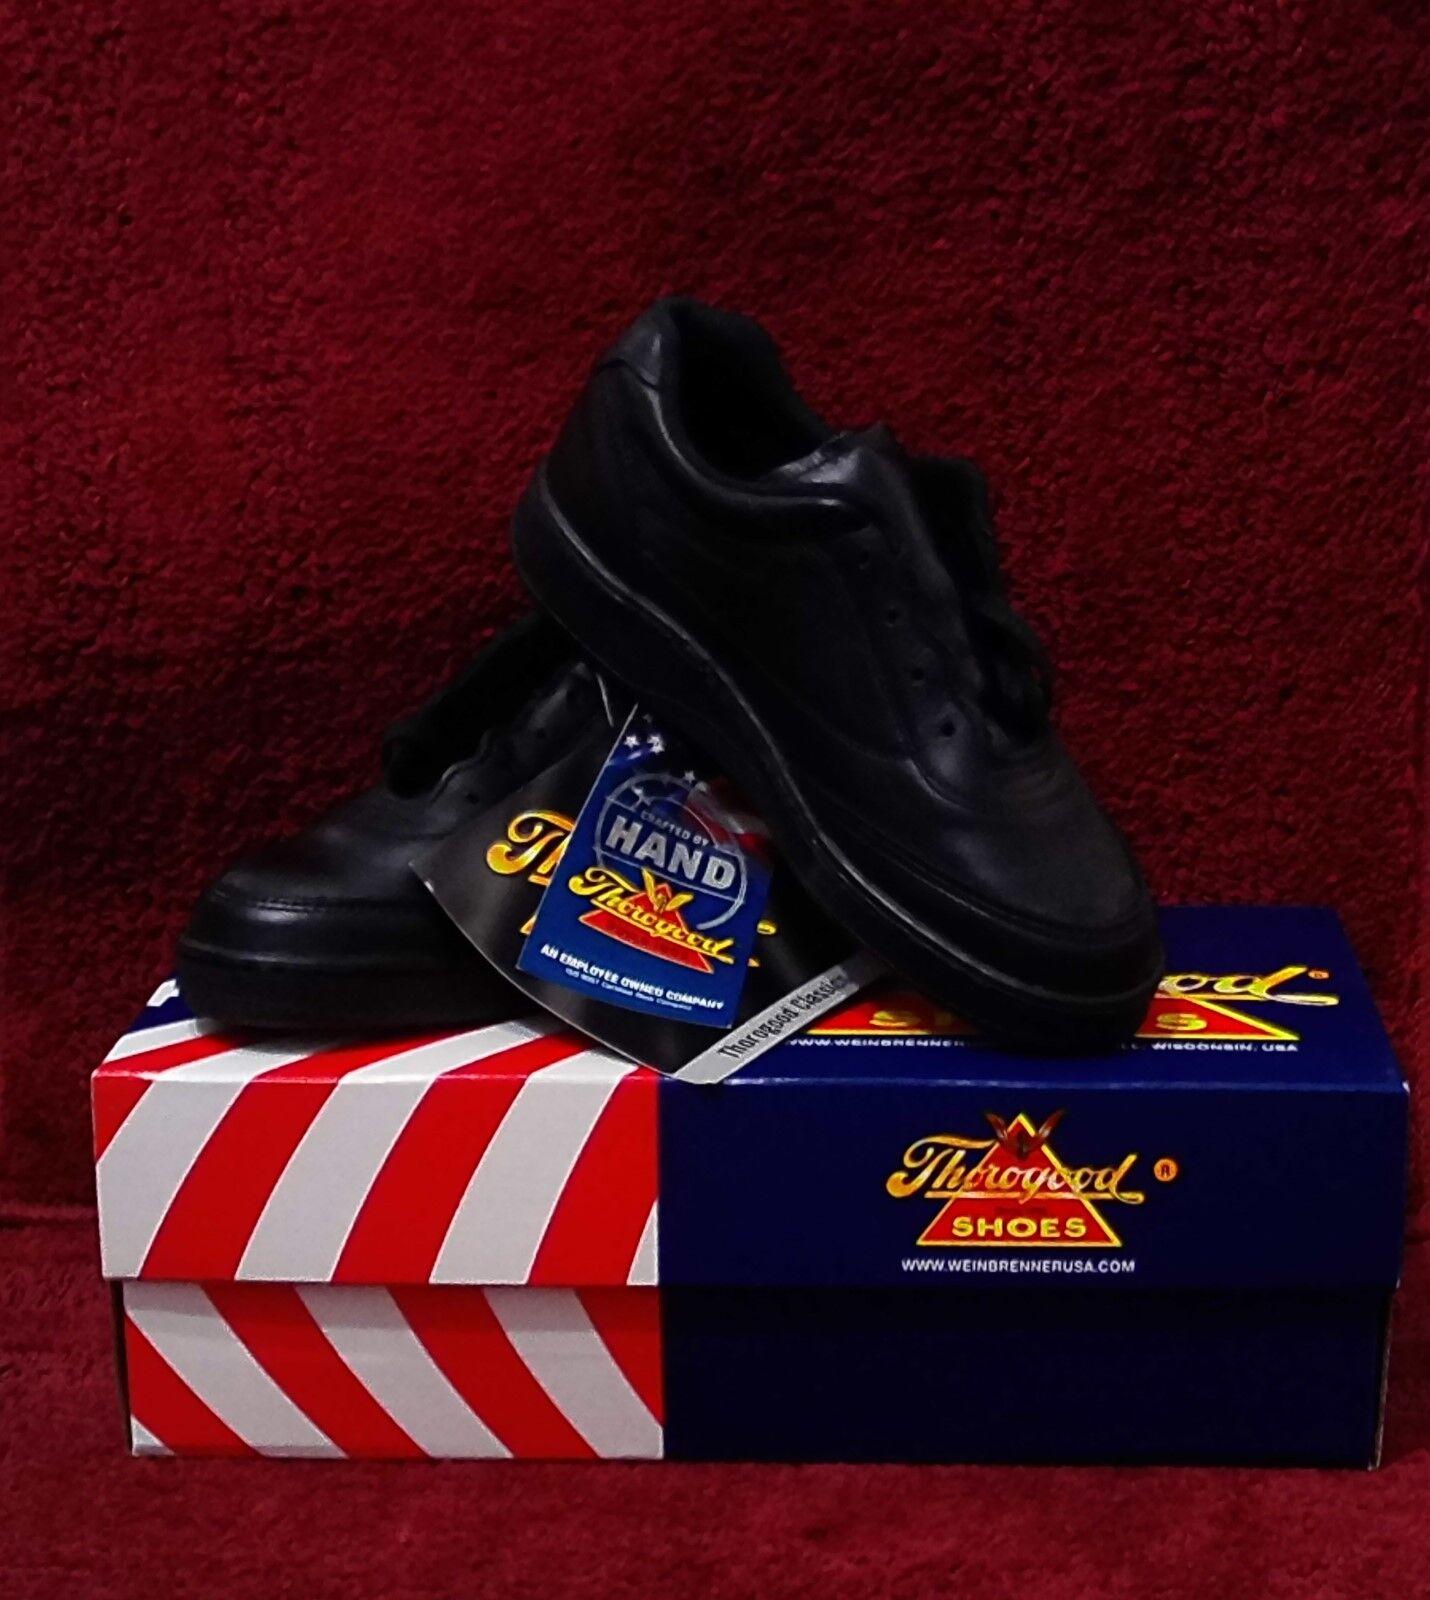 NIB Thorogood Womens Code 3 Oxford Shoes Black Leather Size 7 M